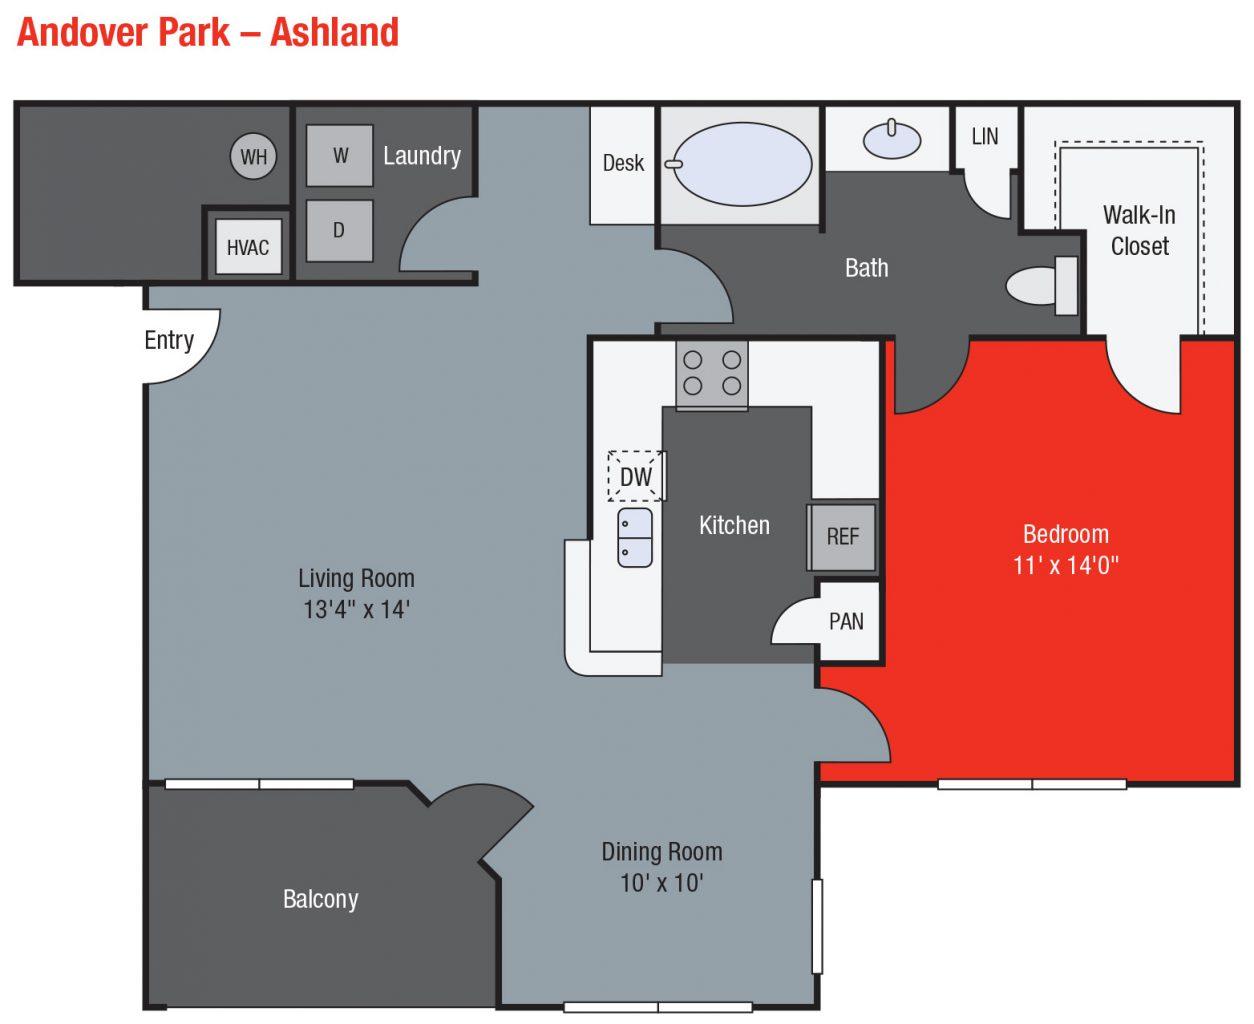 Apartments For Rent TGM Andover Park - Ashland